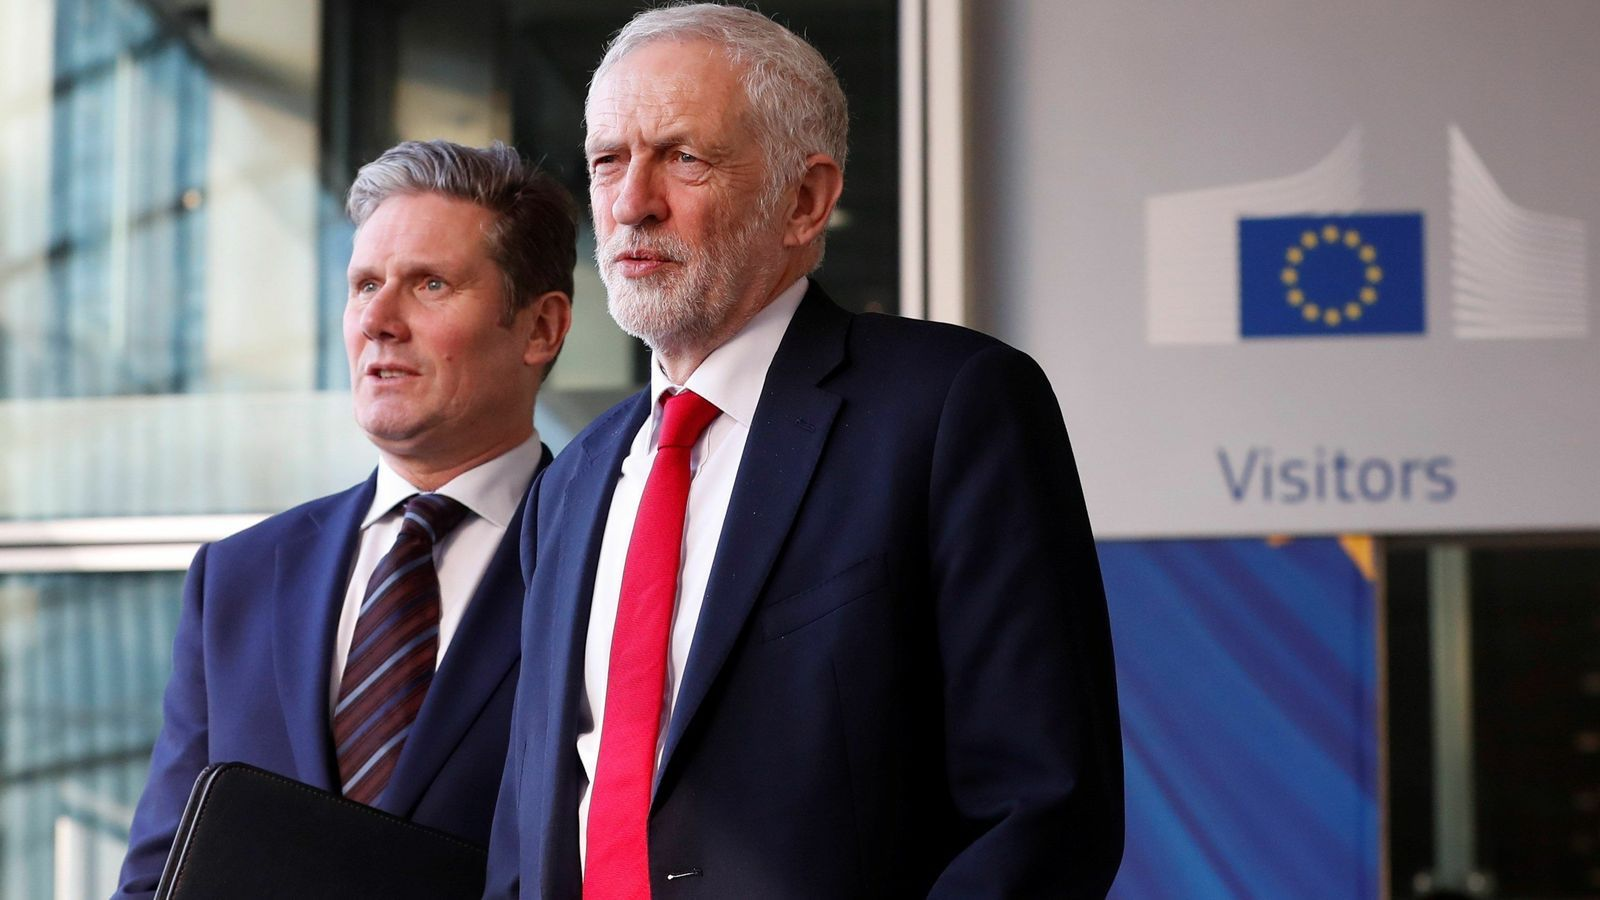 El líder laborista, Jeremy Corbyn, aquest dijous a Brussel·les.